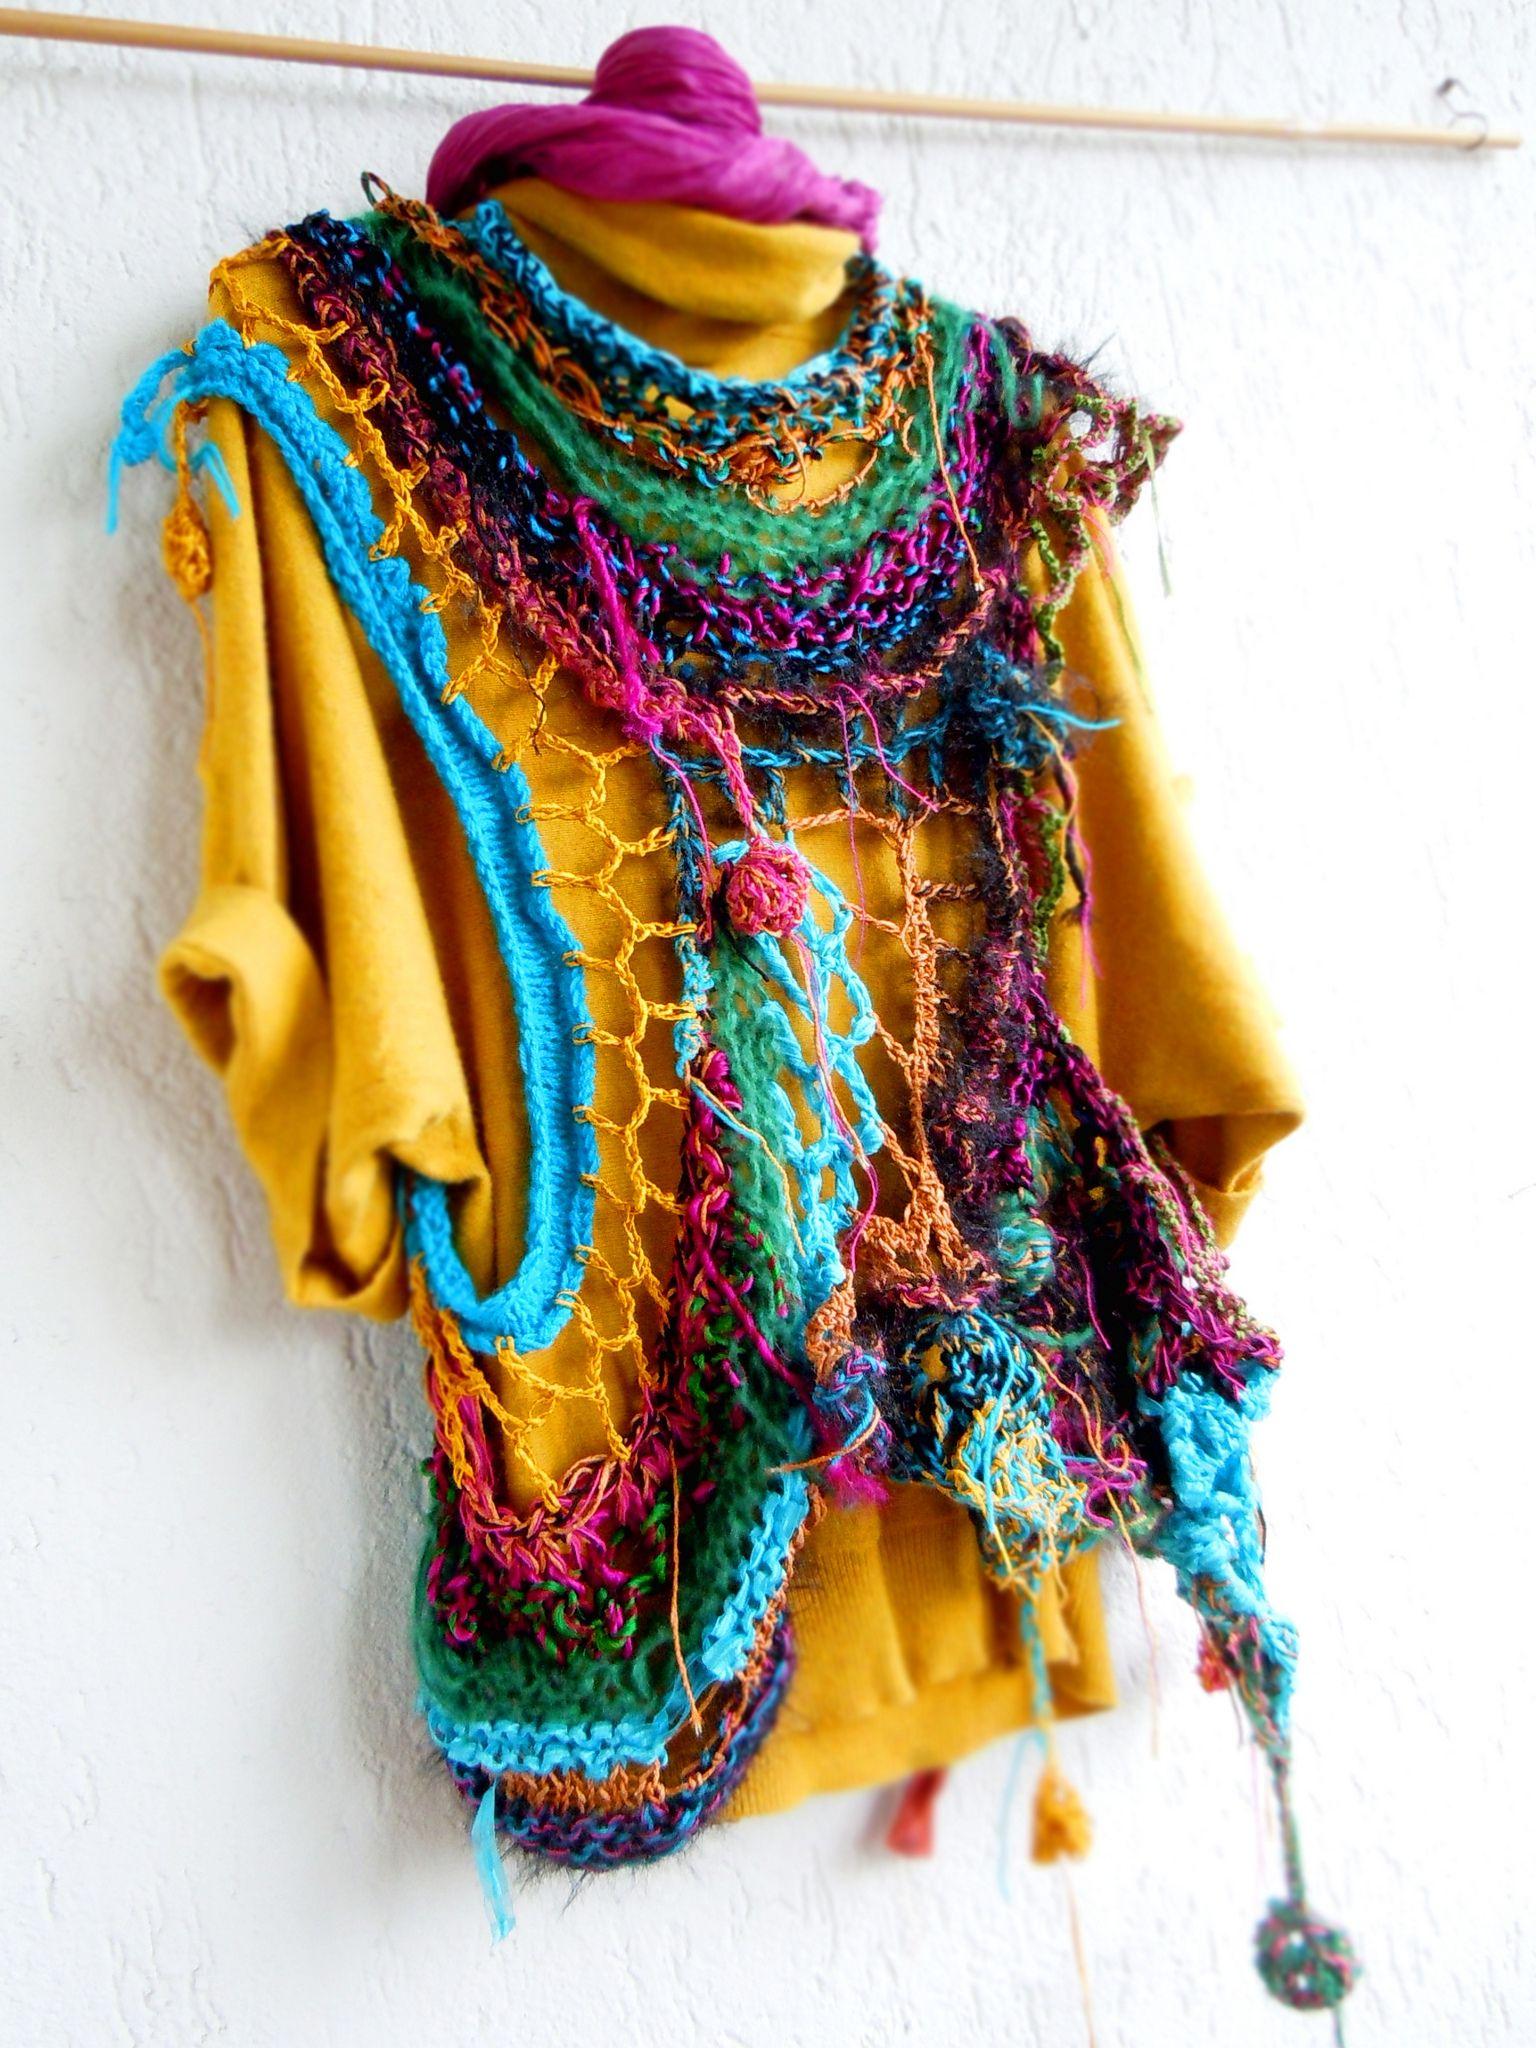 Shivas dance static art yarn sari silk and knitting patterns httpsflicpexgjem shivas dance static sari silkart yarnshivafabric ribbonknitting patternssaris bankloansurffo Gallery